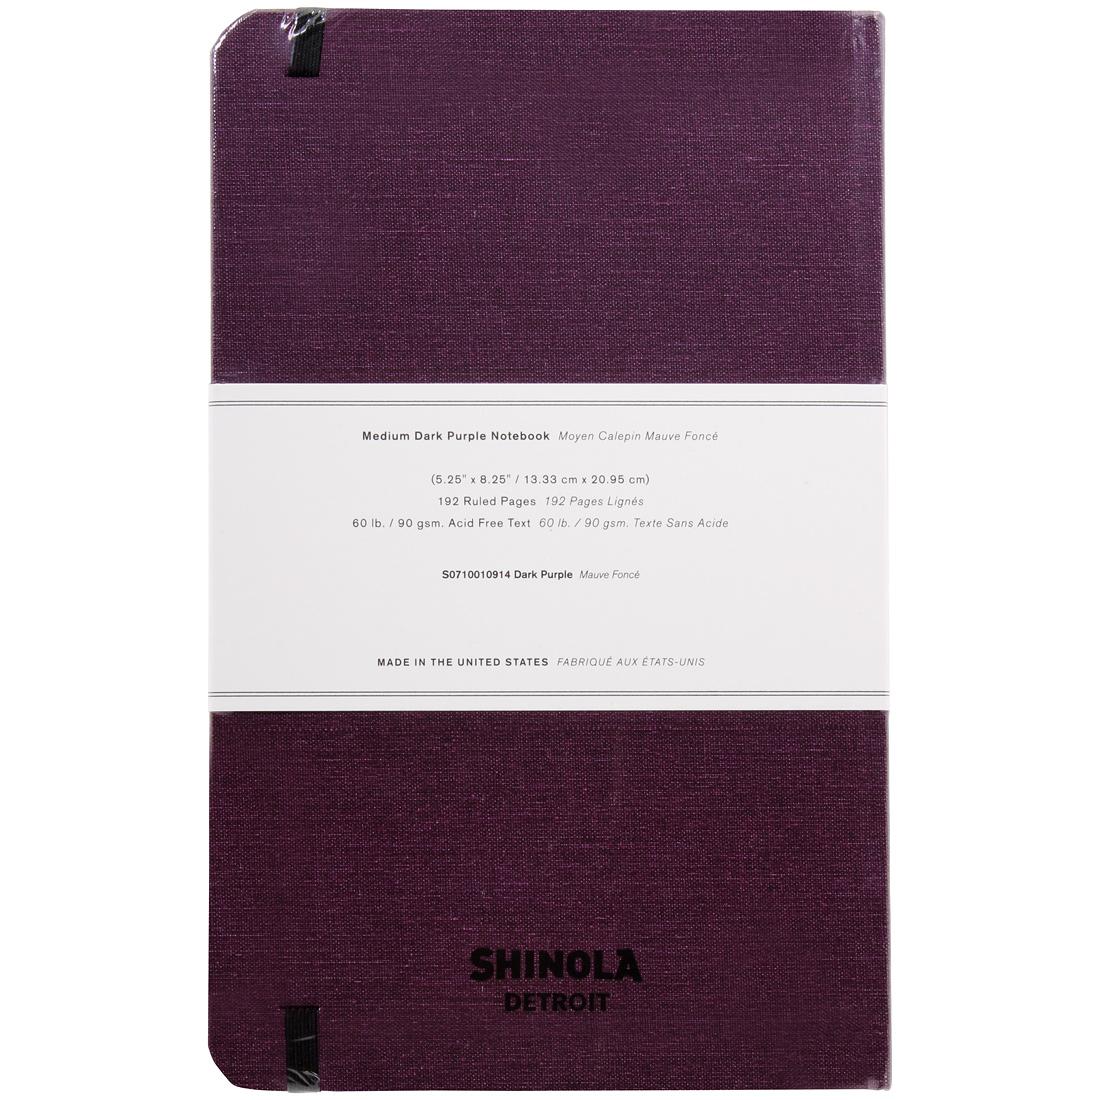 Made in the USA S0710010914 Shinola Detroit Medium Jet Black Notebook